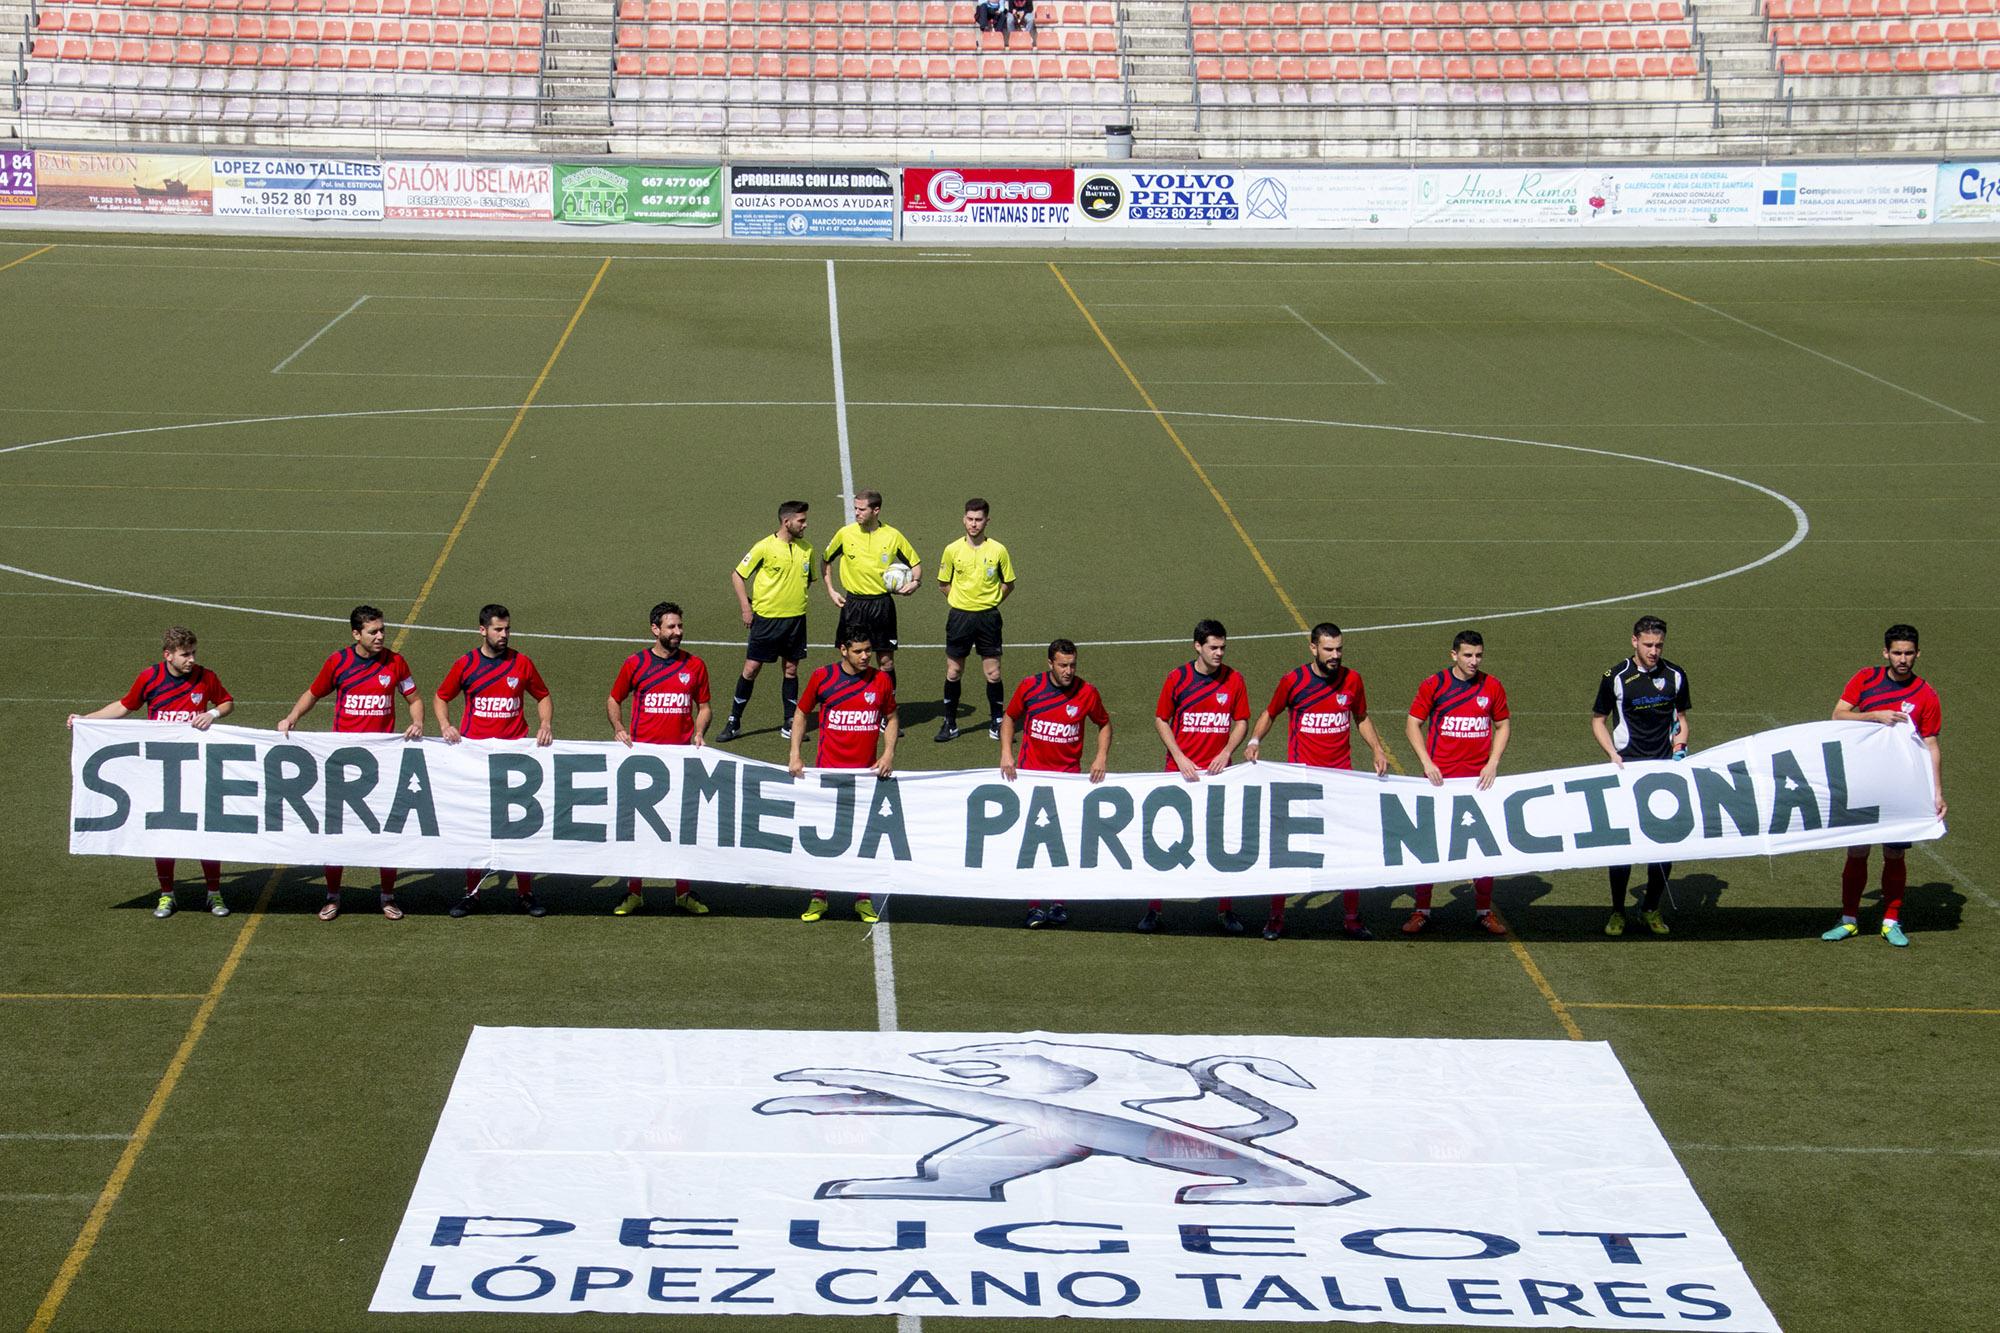 EL CD Estepona apoya Sierra Bermeja Parque Nacional